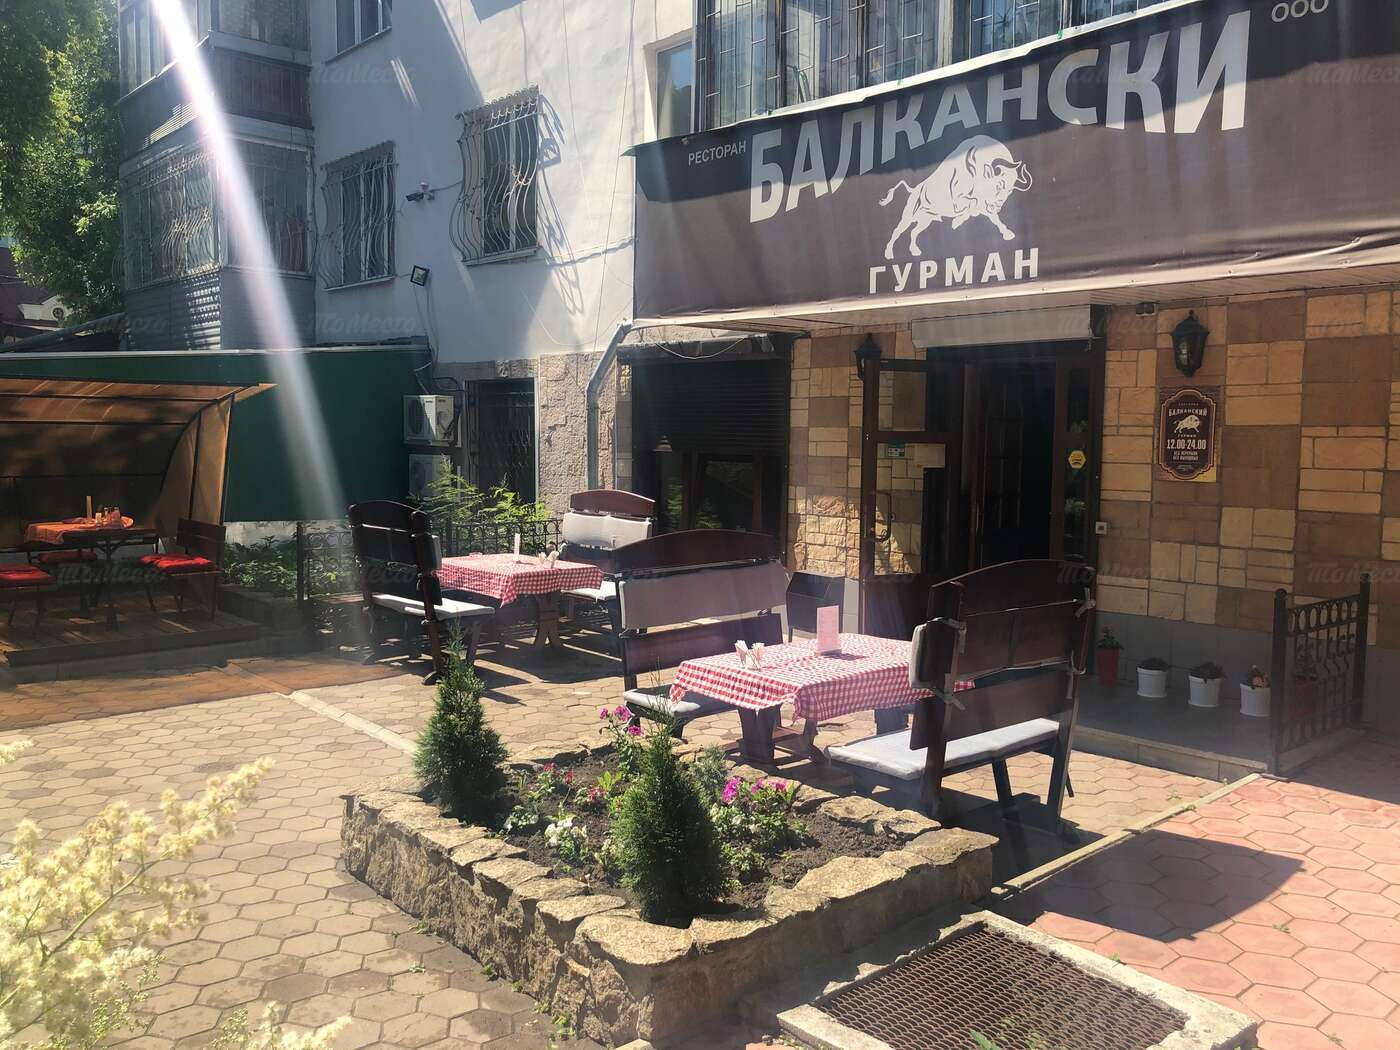 Ресторан Балканский Гурман на Декабристов фото 9